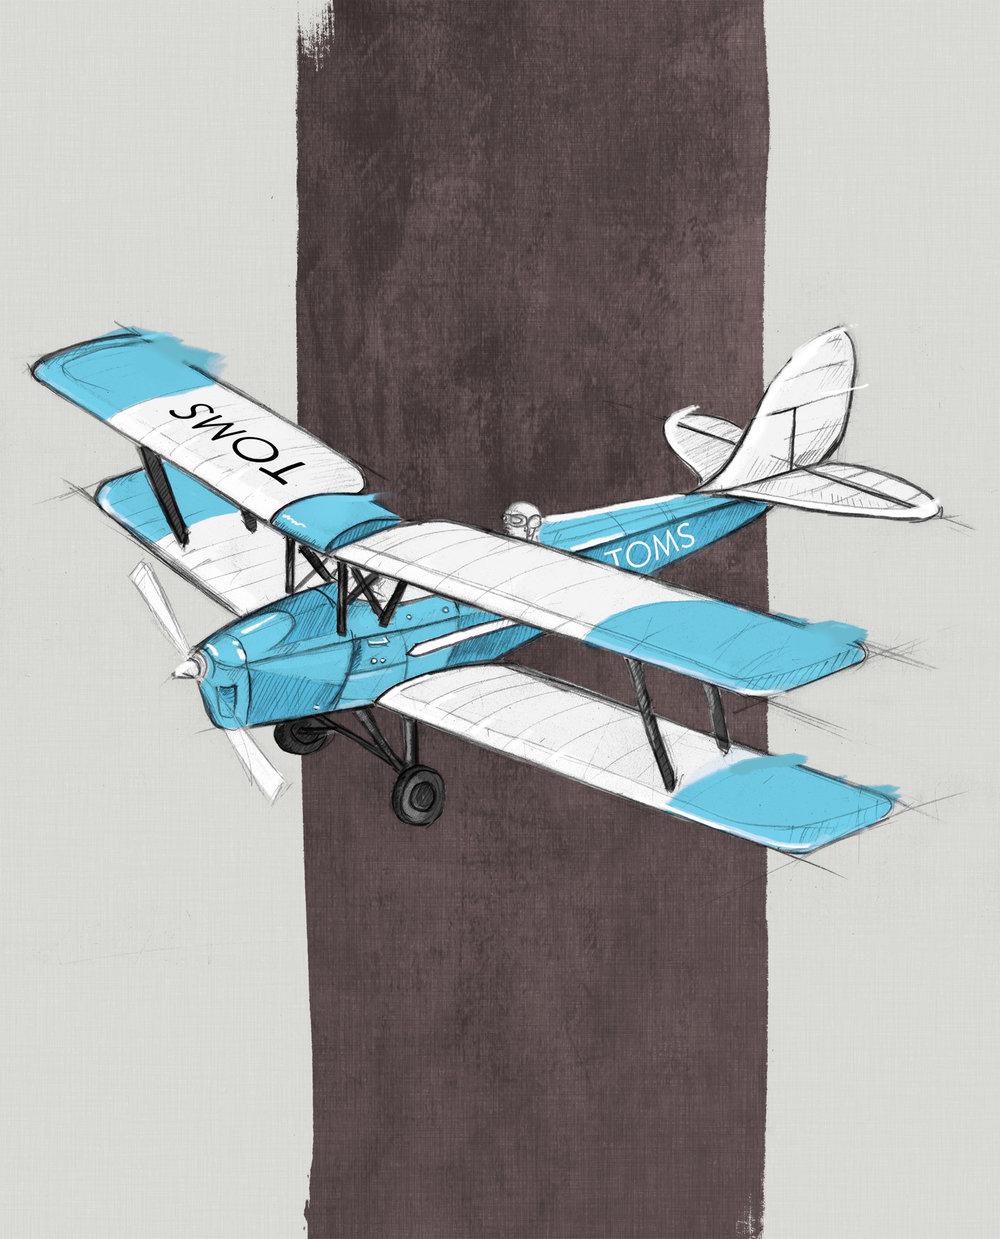 plane reference image.jpg